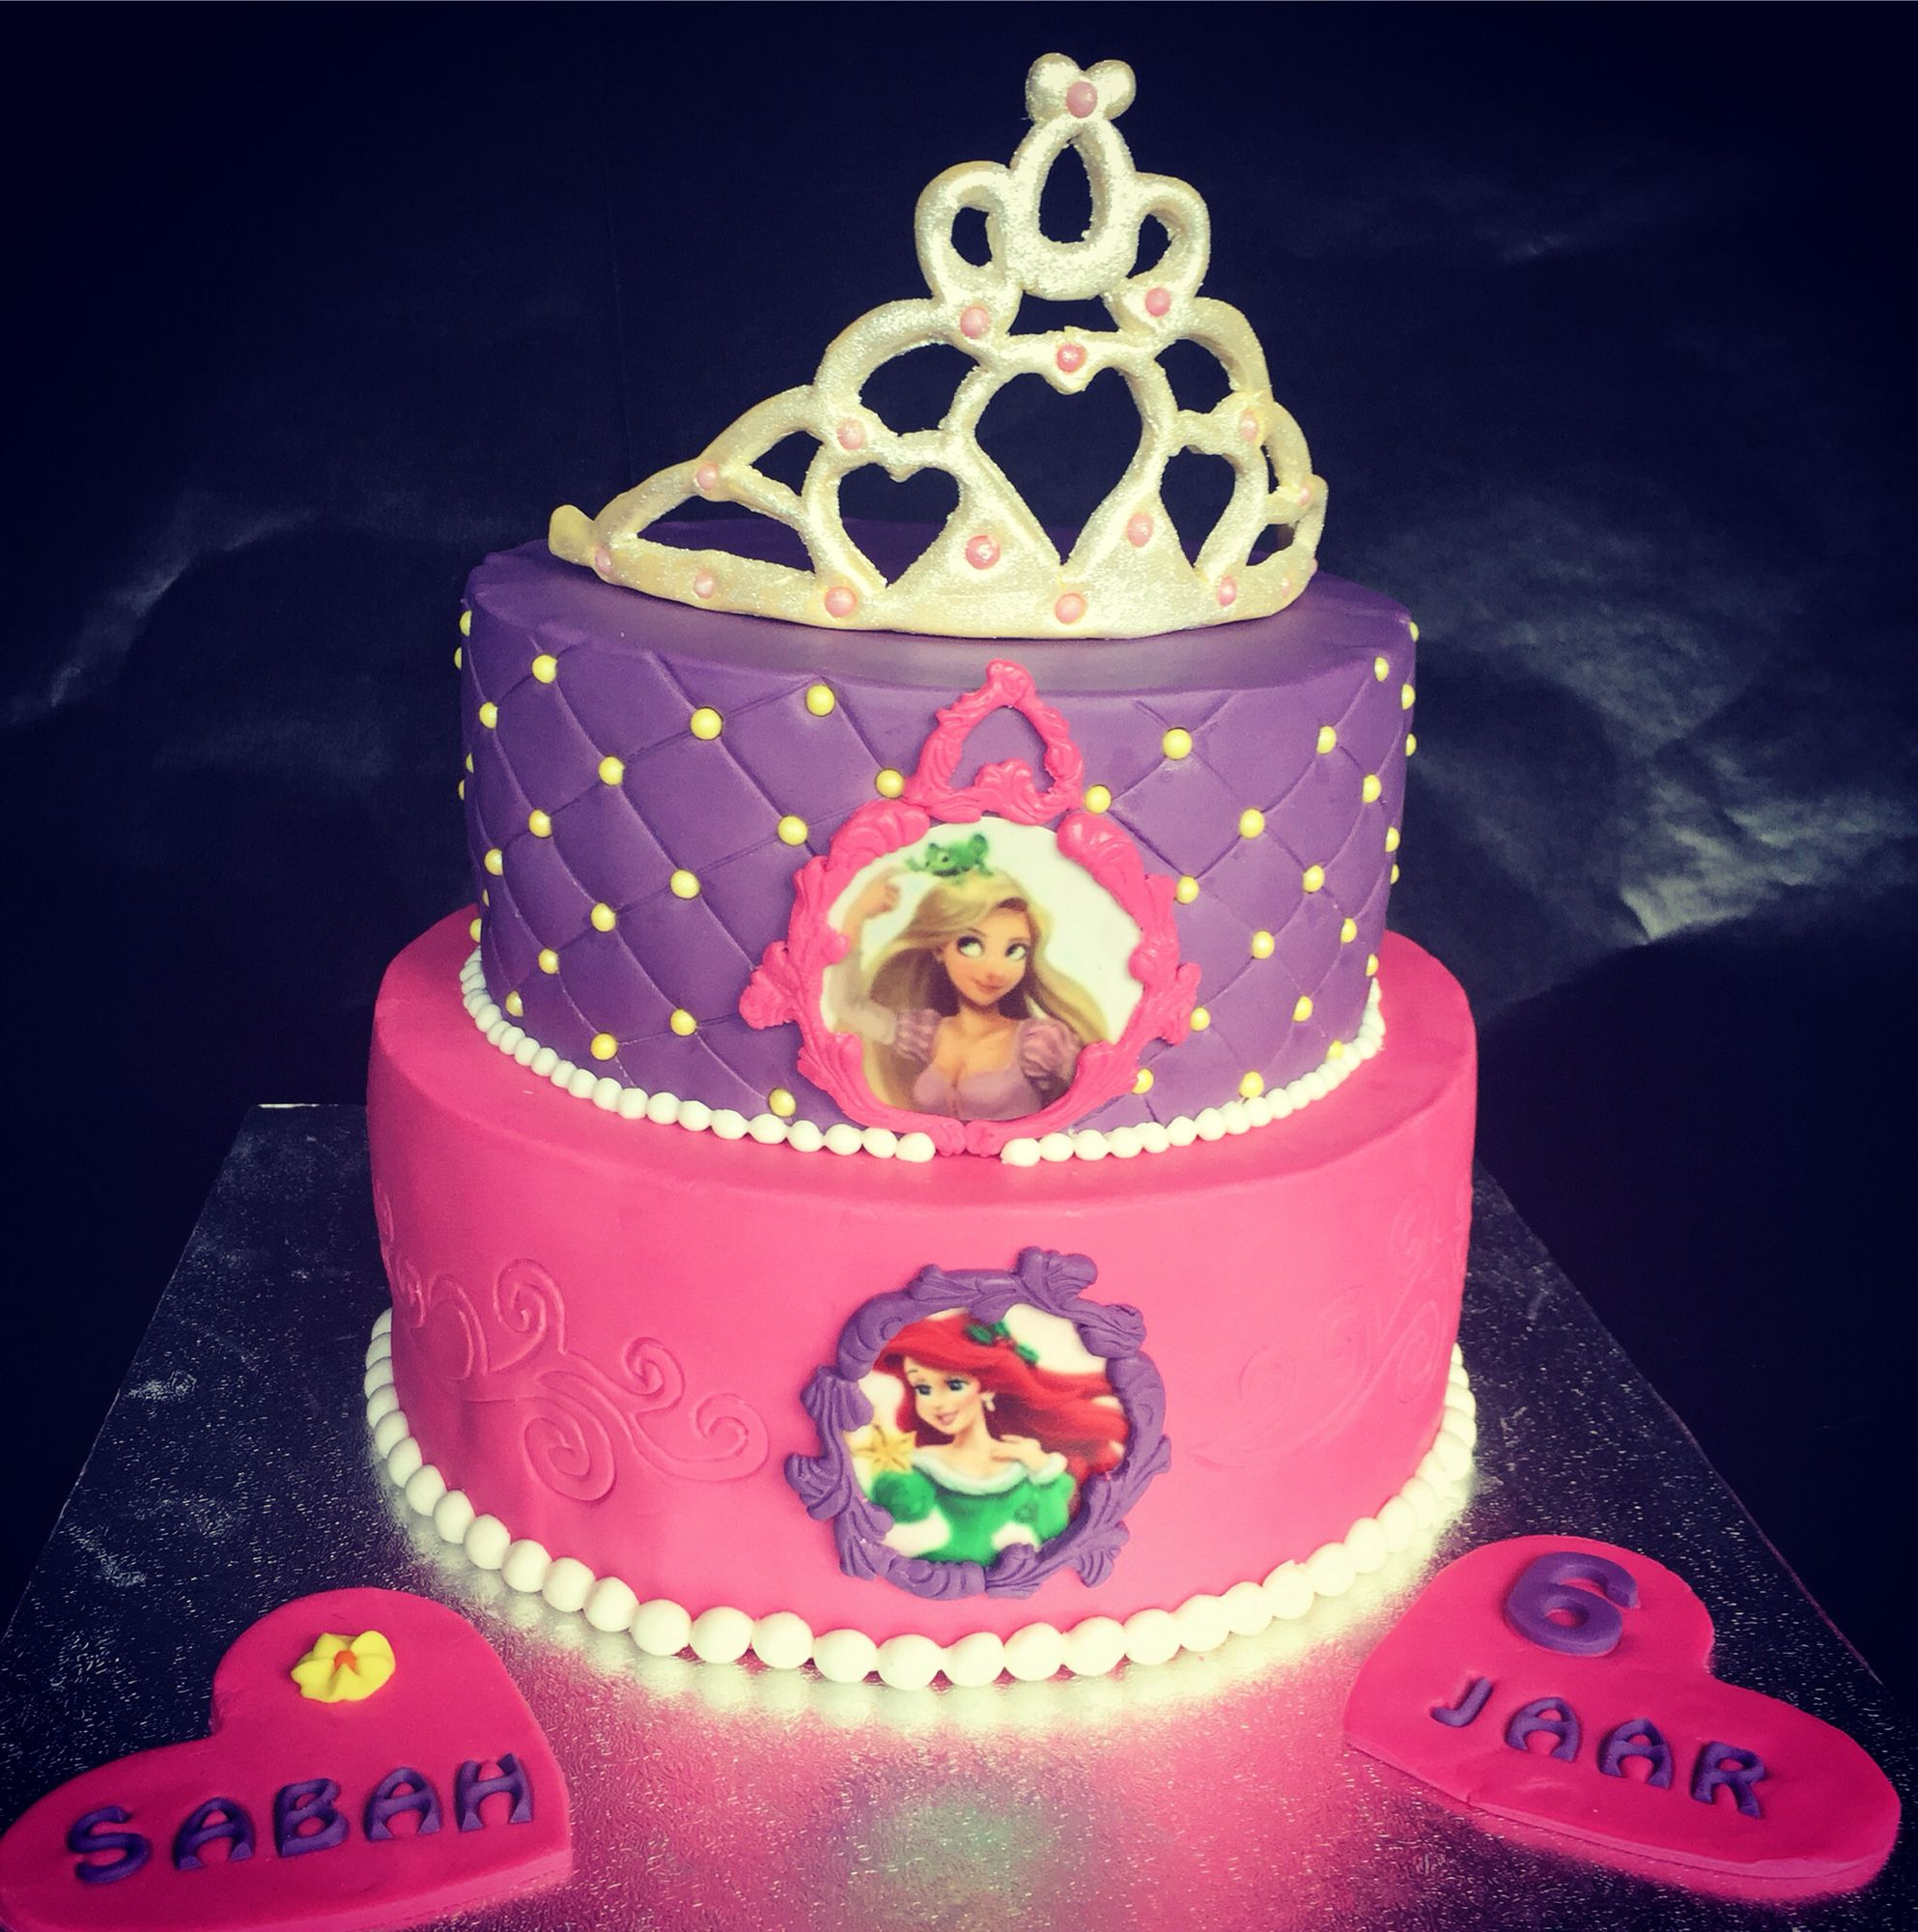 Rapunzelariel cake Birthday Pinterest Ariel cake Cake and Food